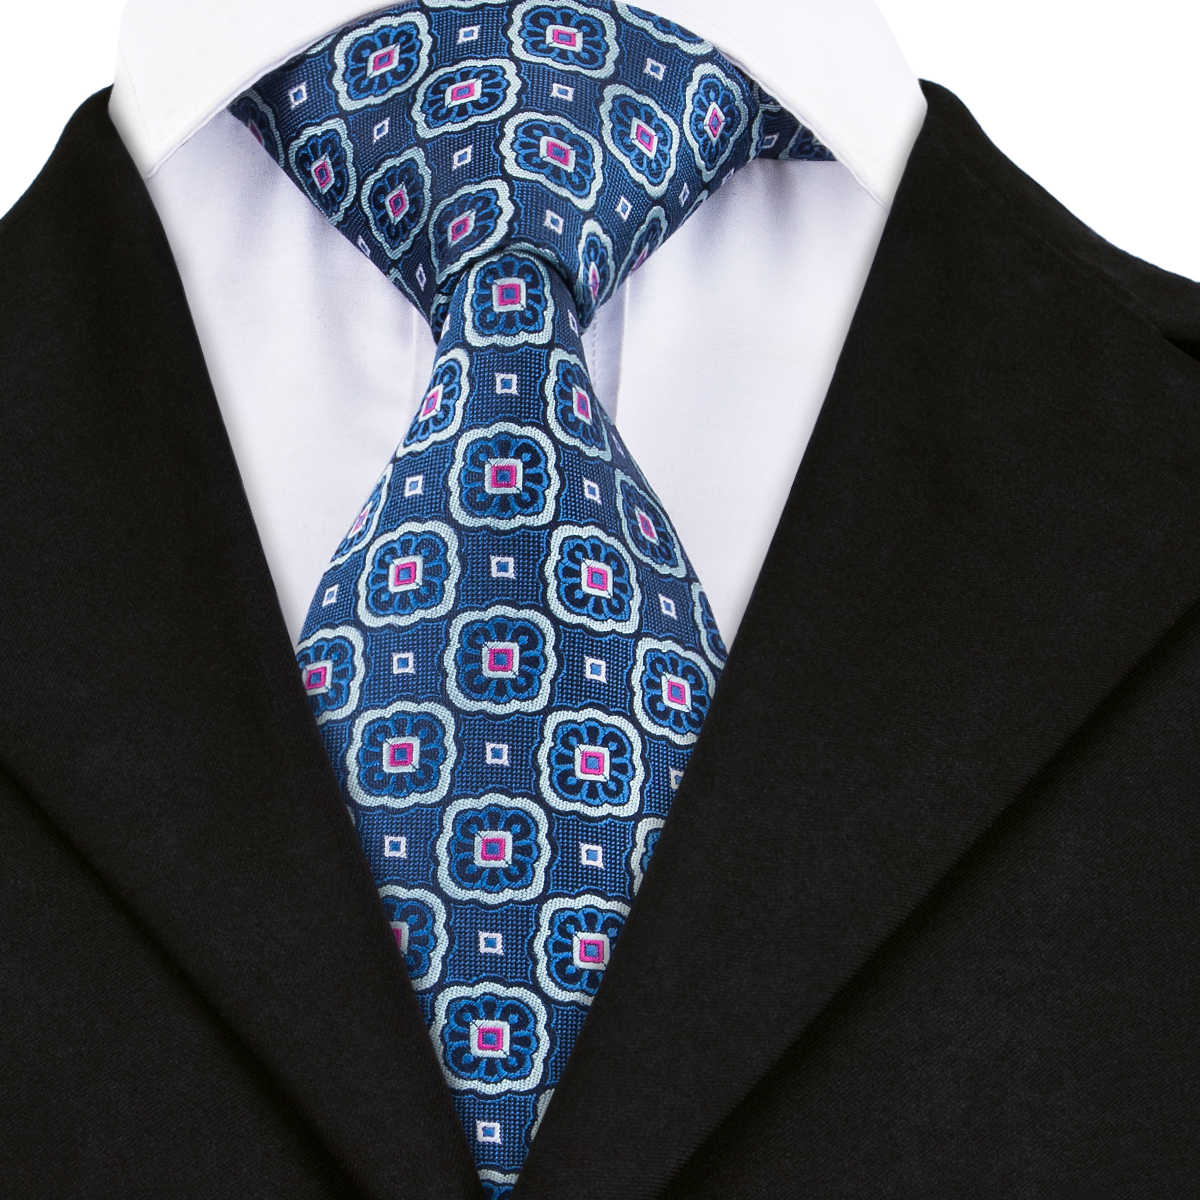 09b55bc67067 Hi-Tie Classic Blue Ties for Men Fashion Floral Jacquare Woven Silk Necktie  Wholesale Pirce